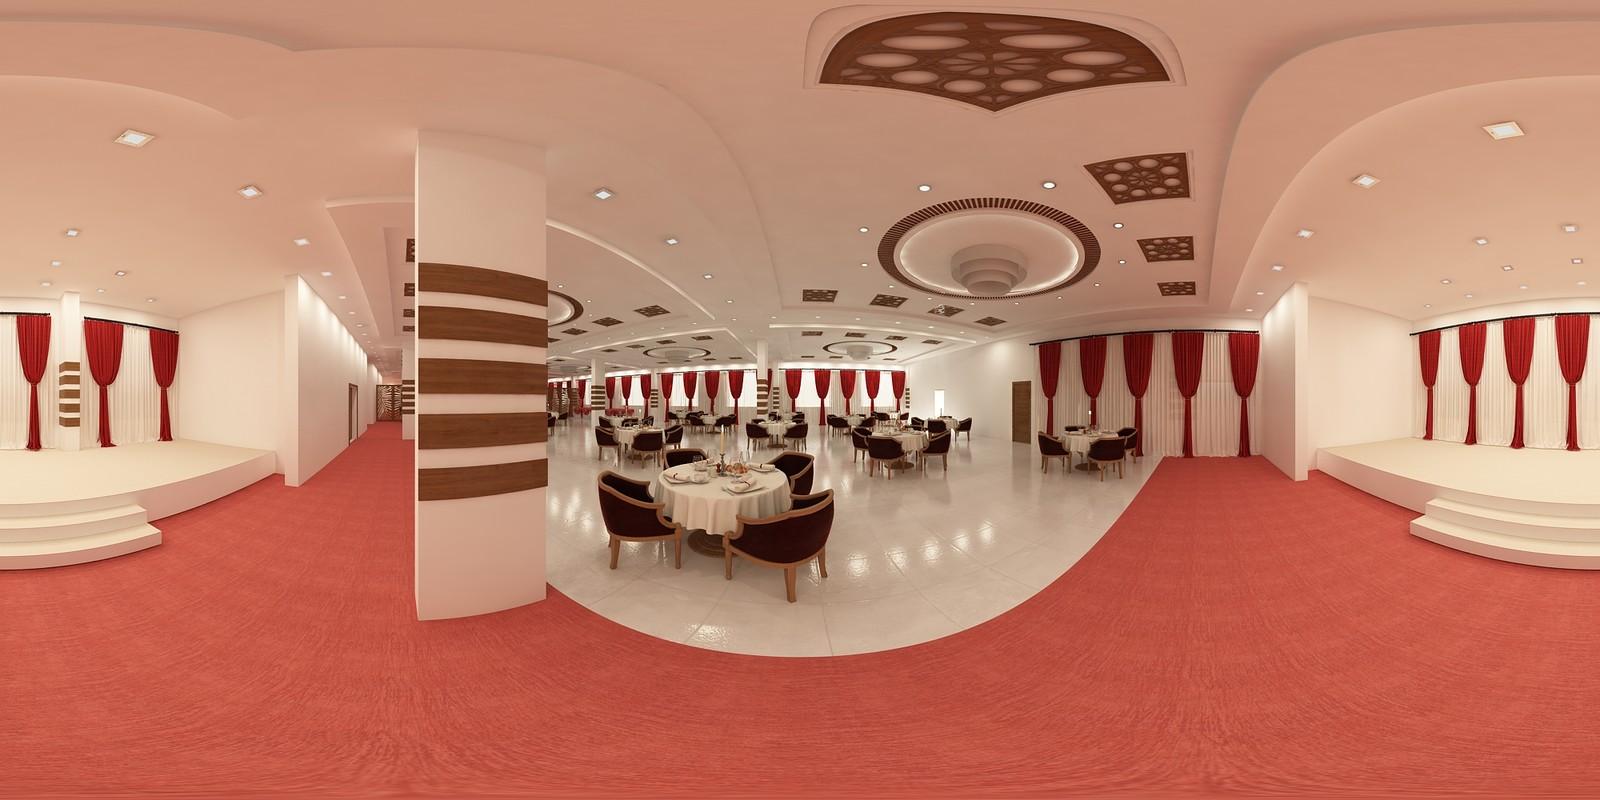 Event Hall 360 Panorama